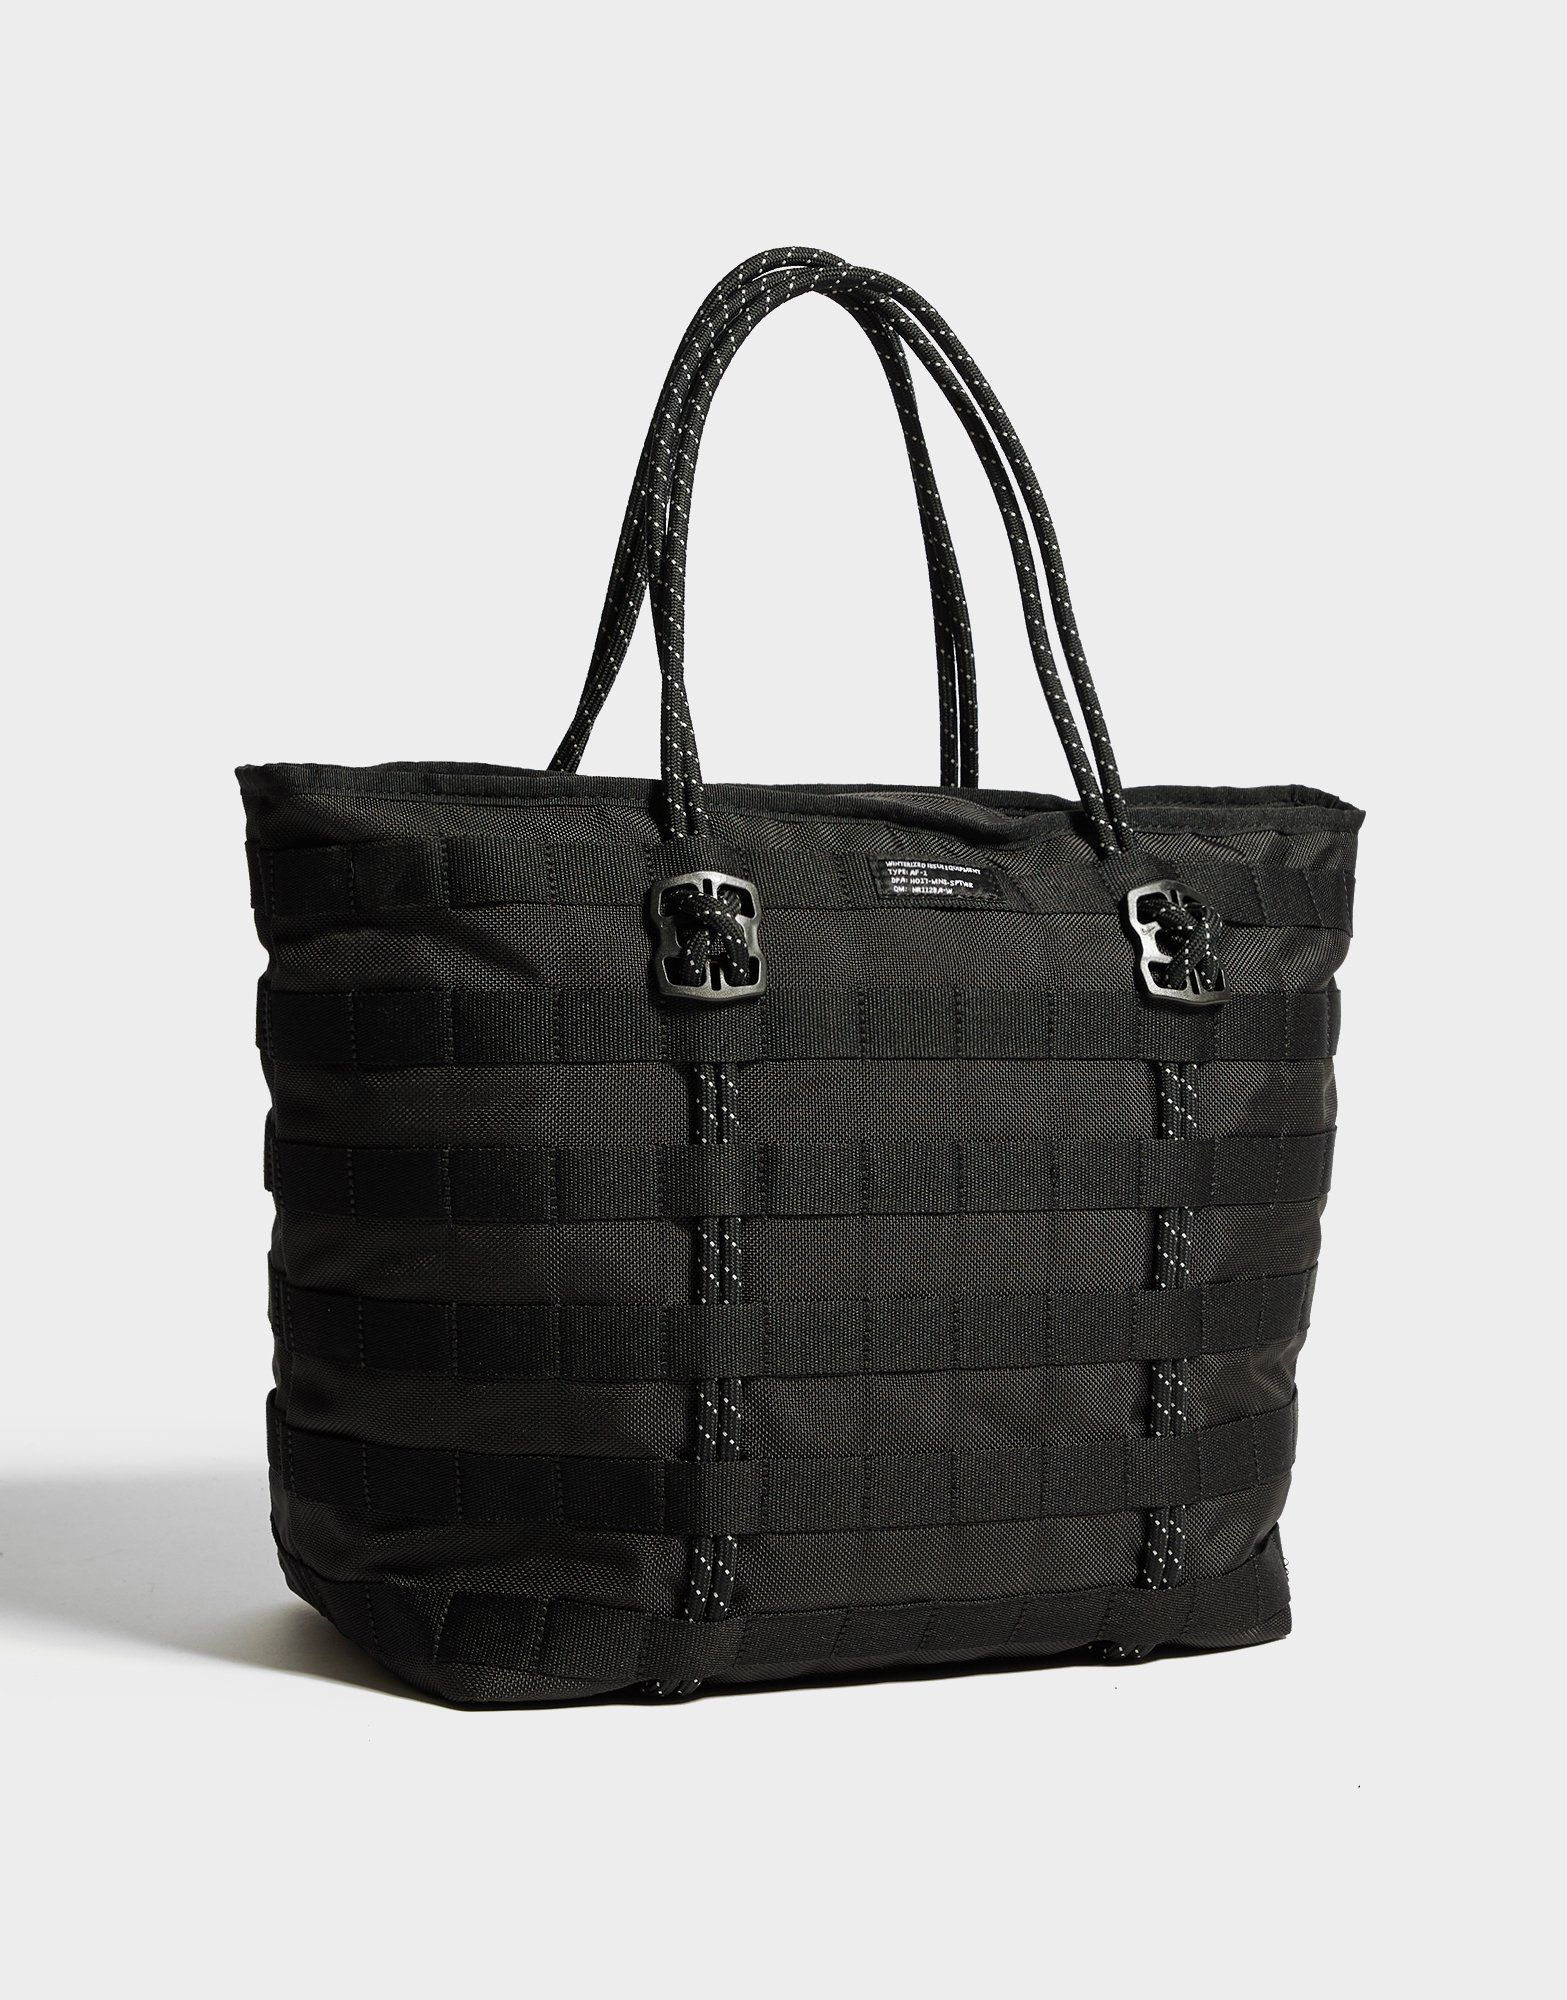 NIKE Nike Sportswear AF1 Tote Bag Tote bag, Bags, Nike totes